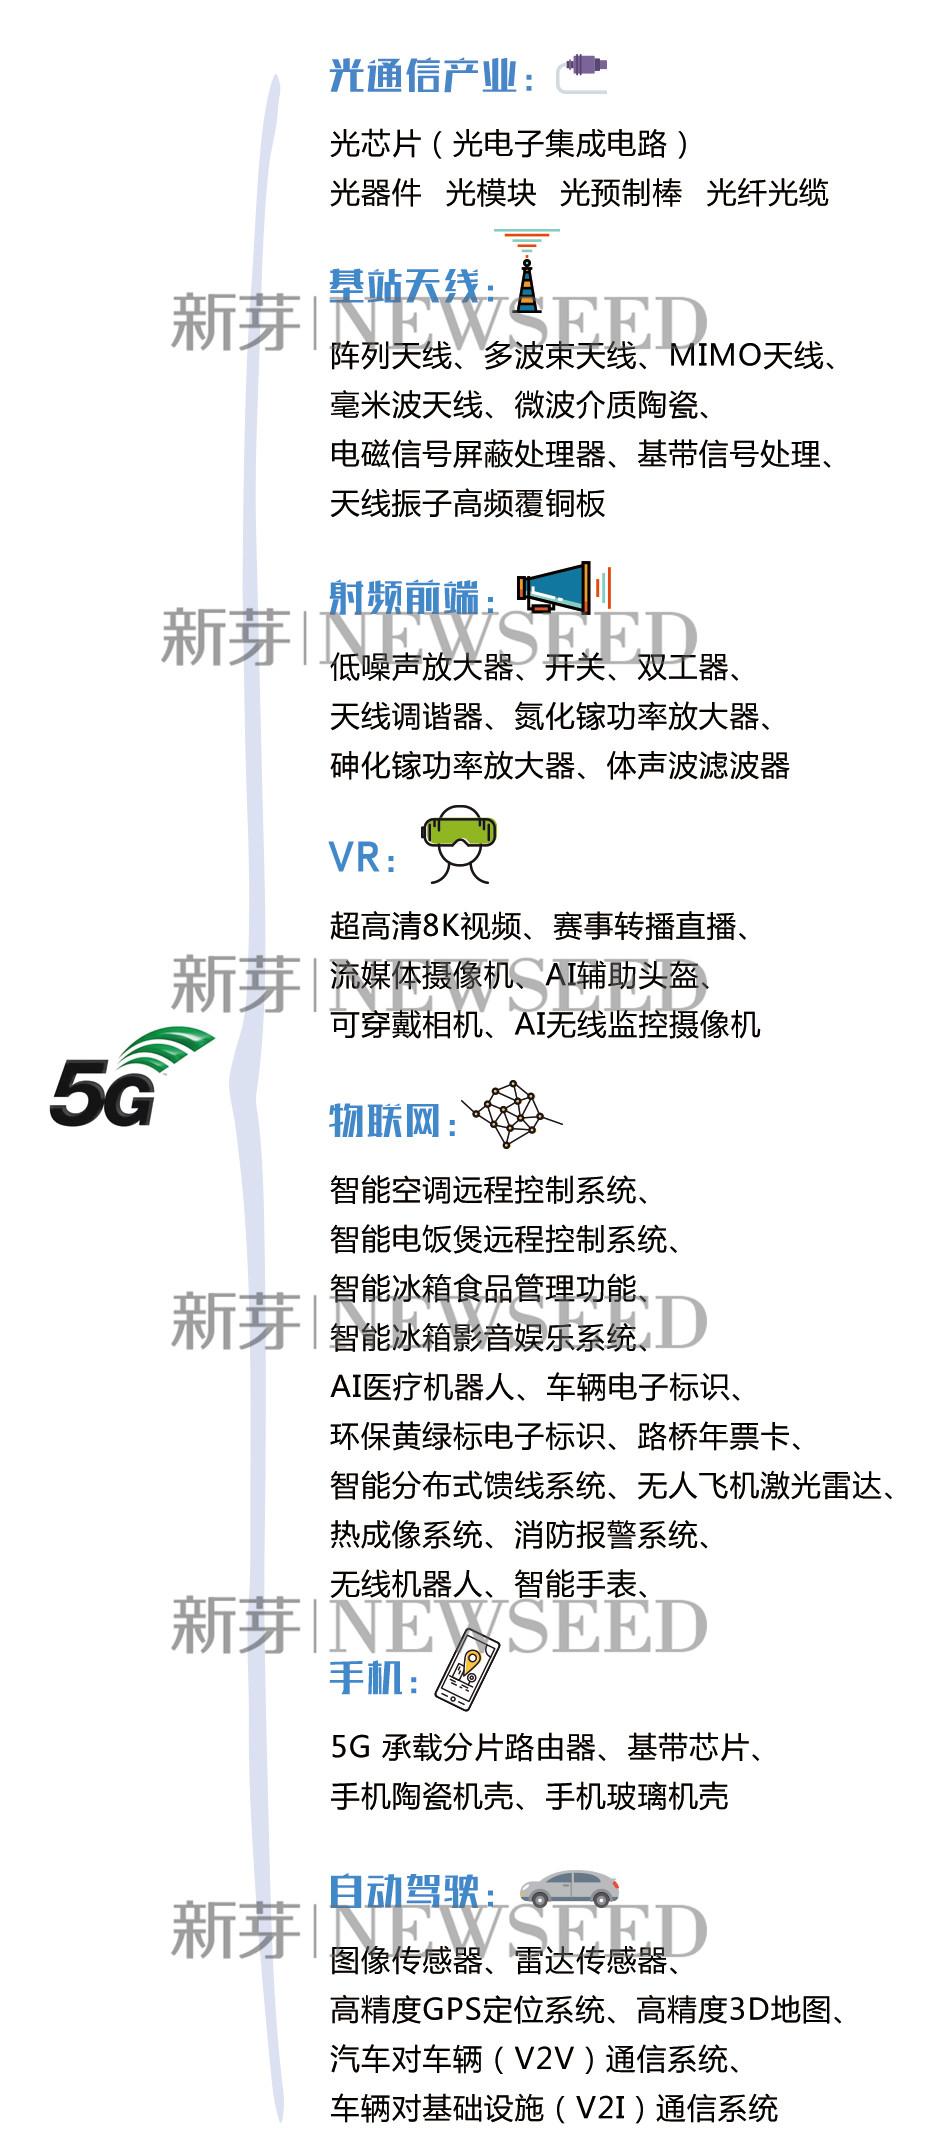 5G时代的50个创业机会了解一下